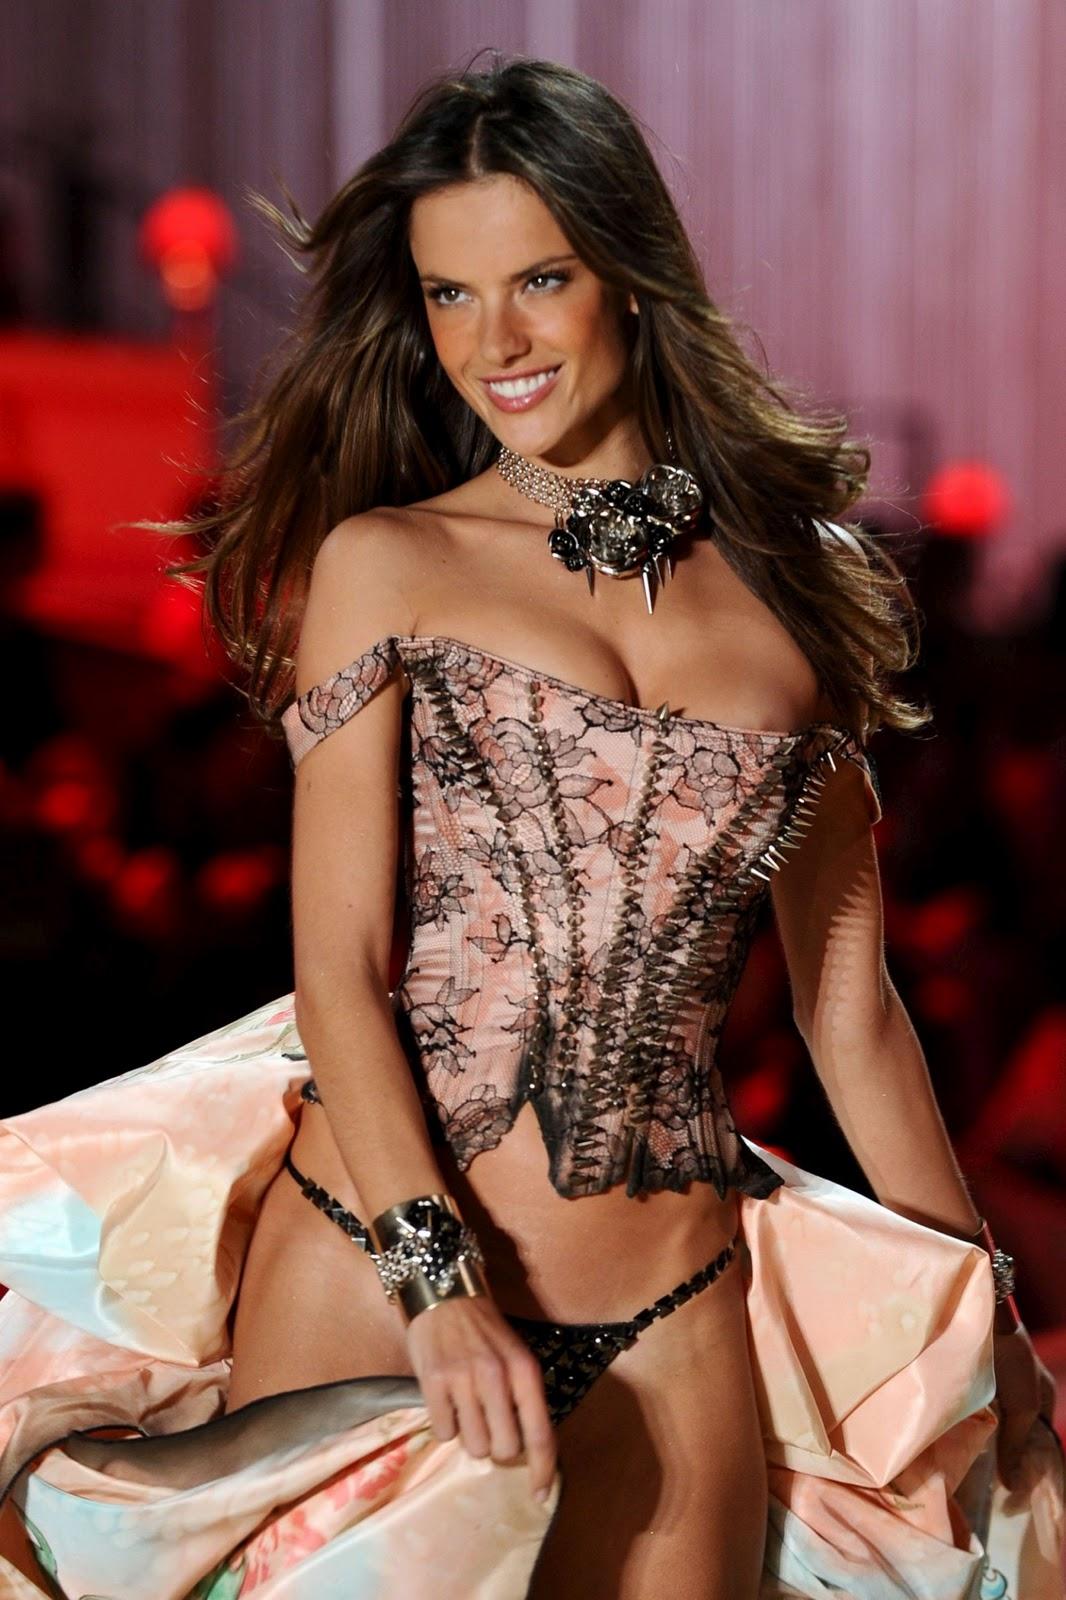 http://4.bp.blogspot.com/_bvCb8nvIuW0/TOFXs8gPMEI/AAAAAAAAH-k/RZ8ujtr96bE/s1600/alessandra-ambrosio-vs-fashion-002.jpg